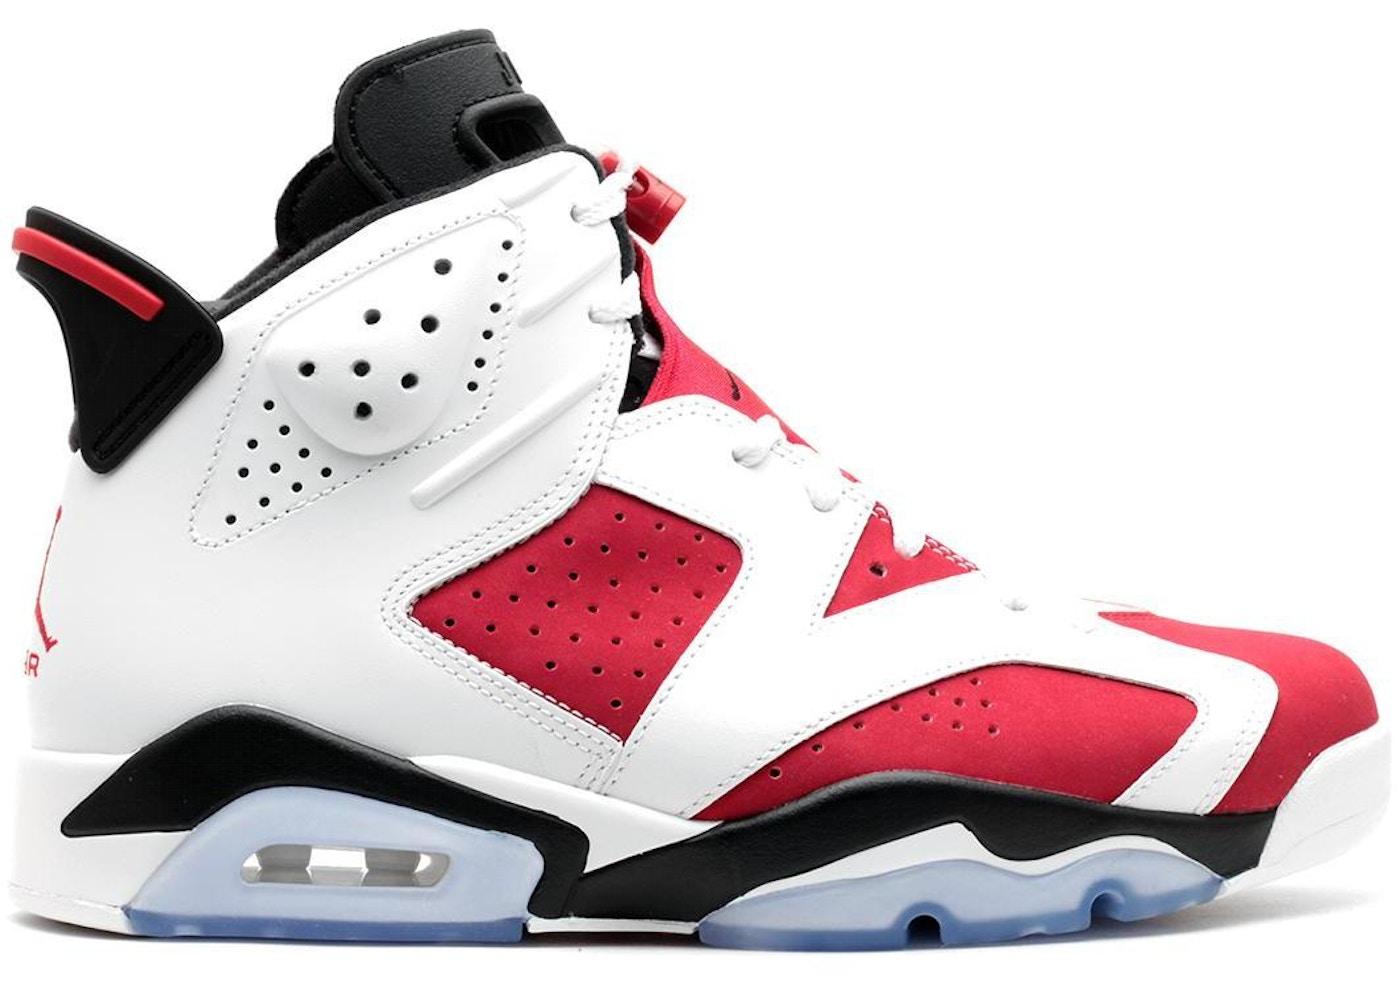 outlet store 09b83 71e23 Buy Air Jordan 6 Shoes & Deadstock Sneakers